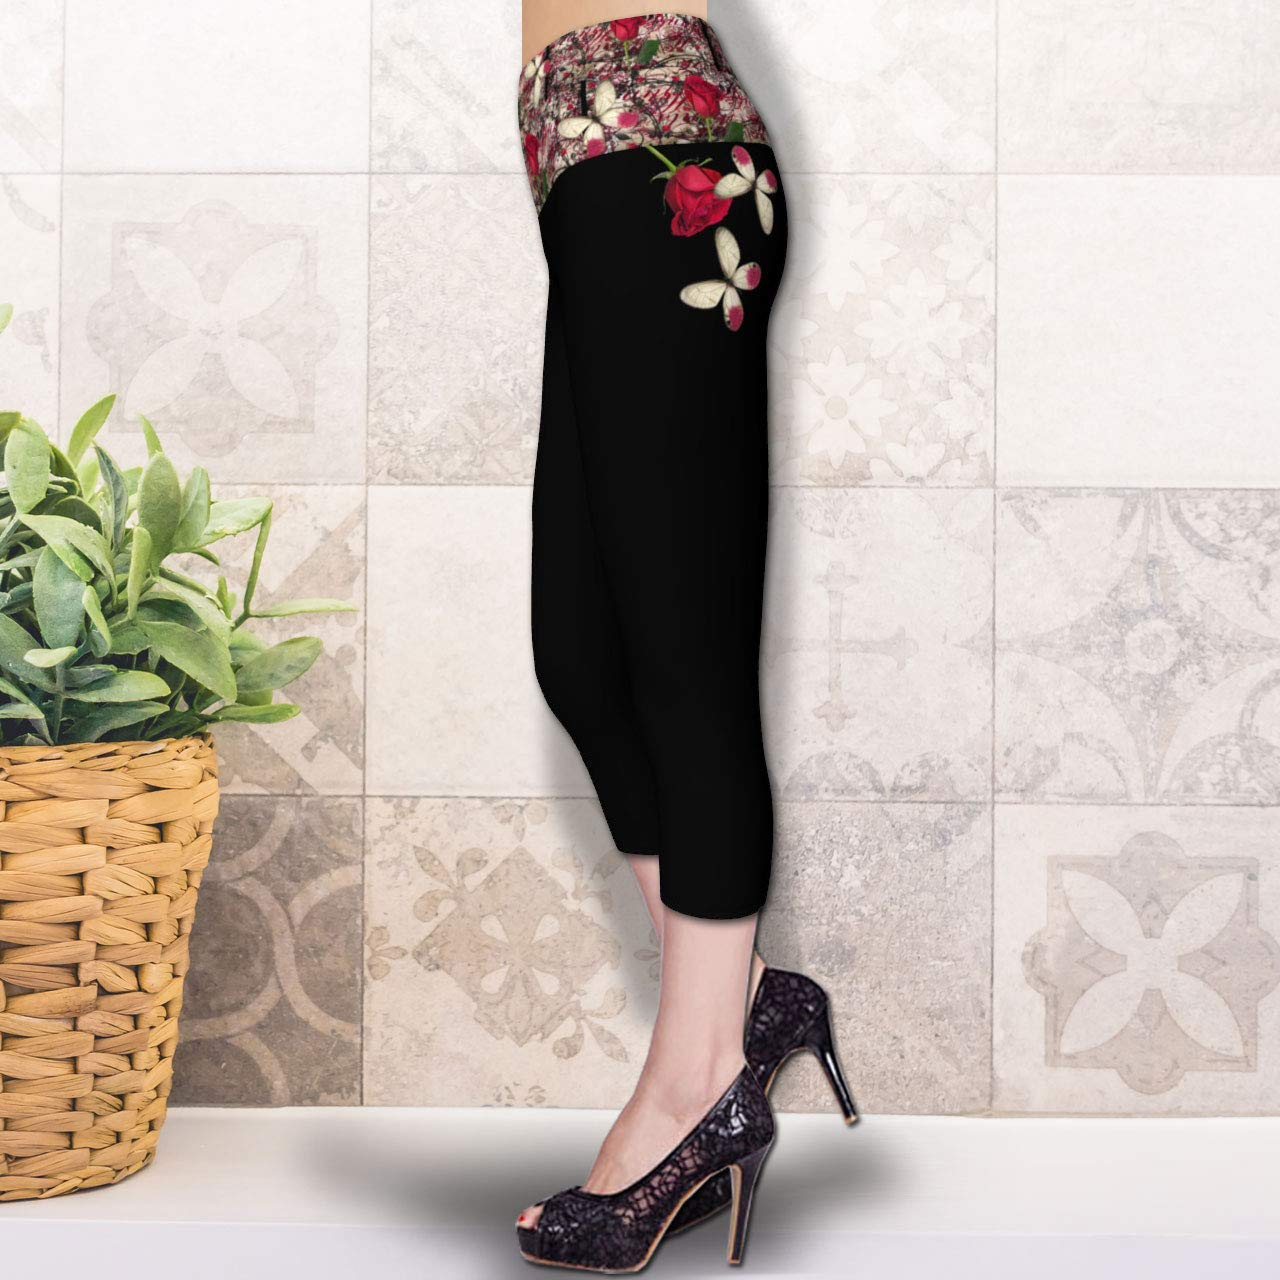 Vintage Rose & Butterfly Black Spandex Festival Cropped Length Yoga Capri Leggings Size XL